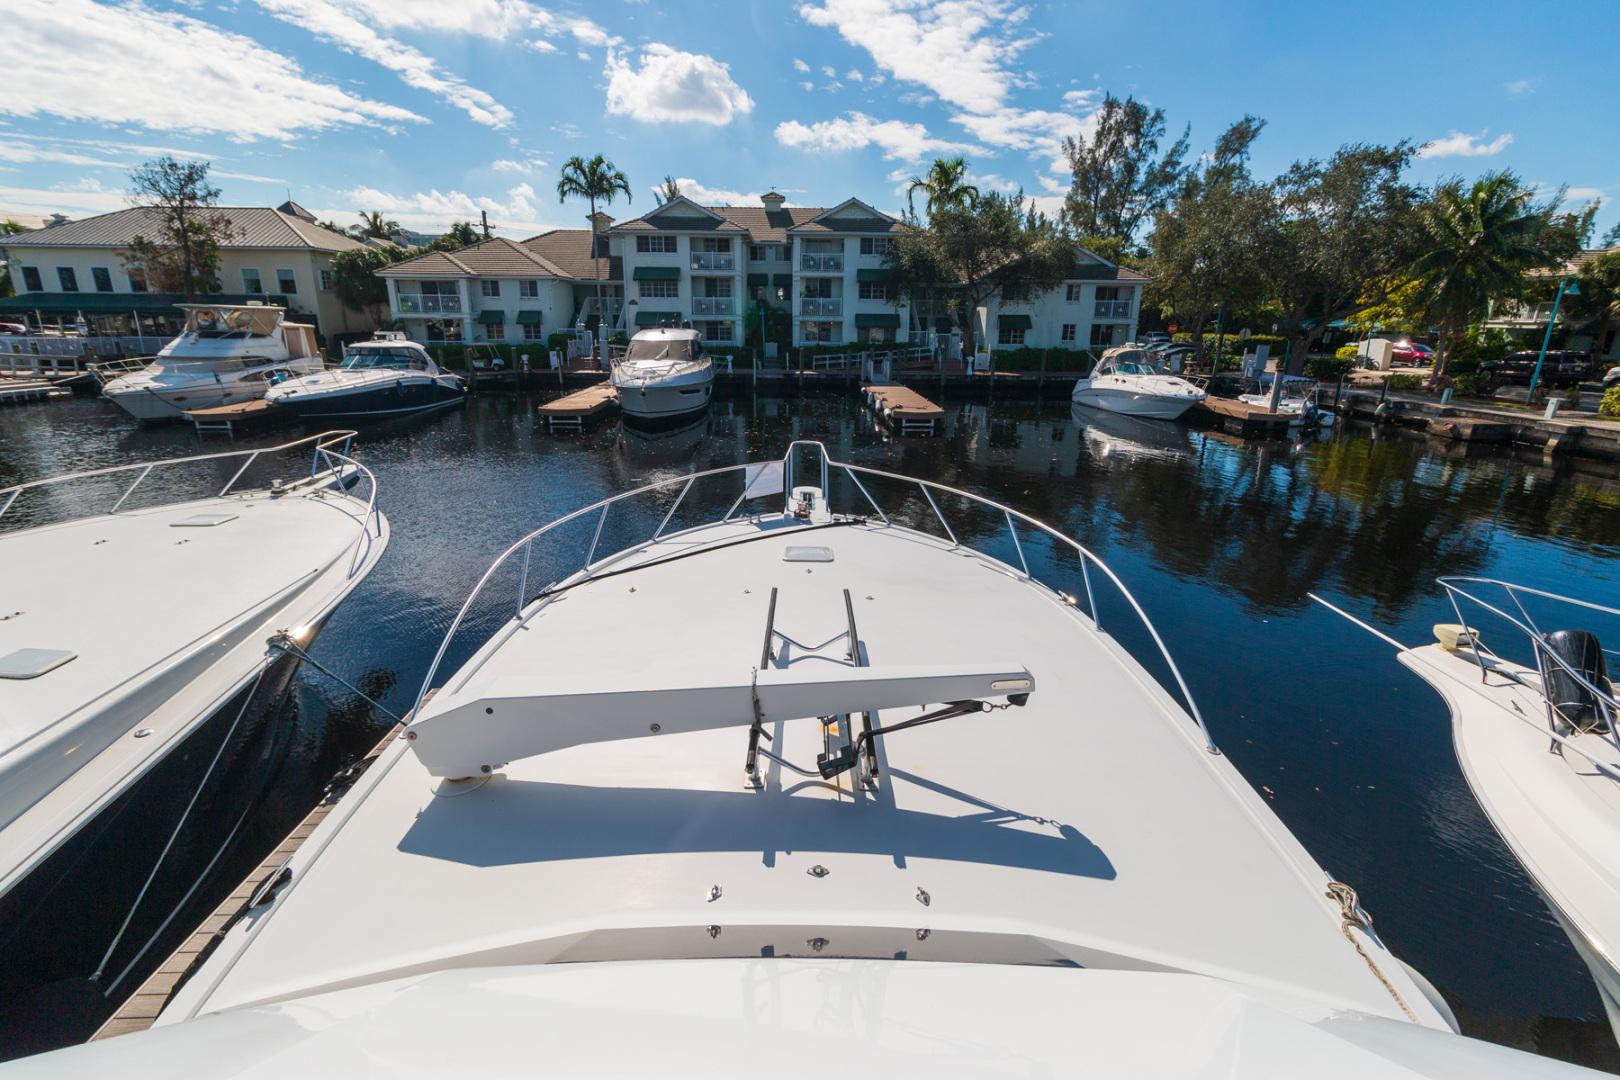 Viking-Convertible 2000-Knotty Girl Fort Lauderdale-Florida-United States-1564783   Thumbnail